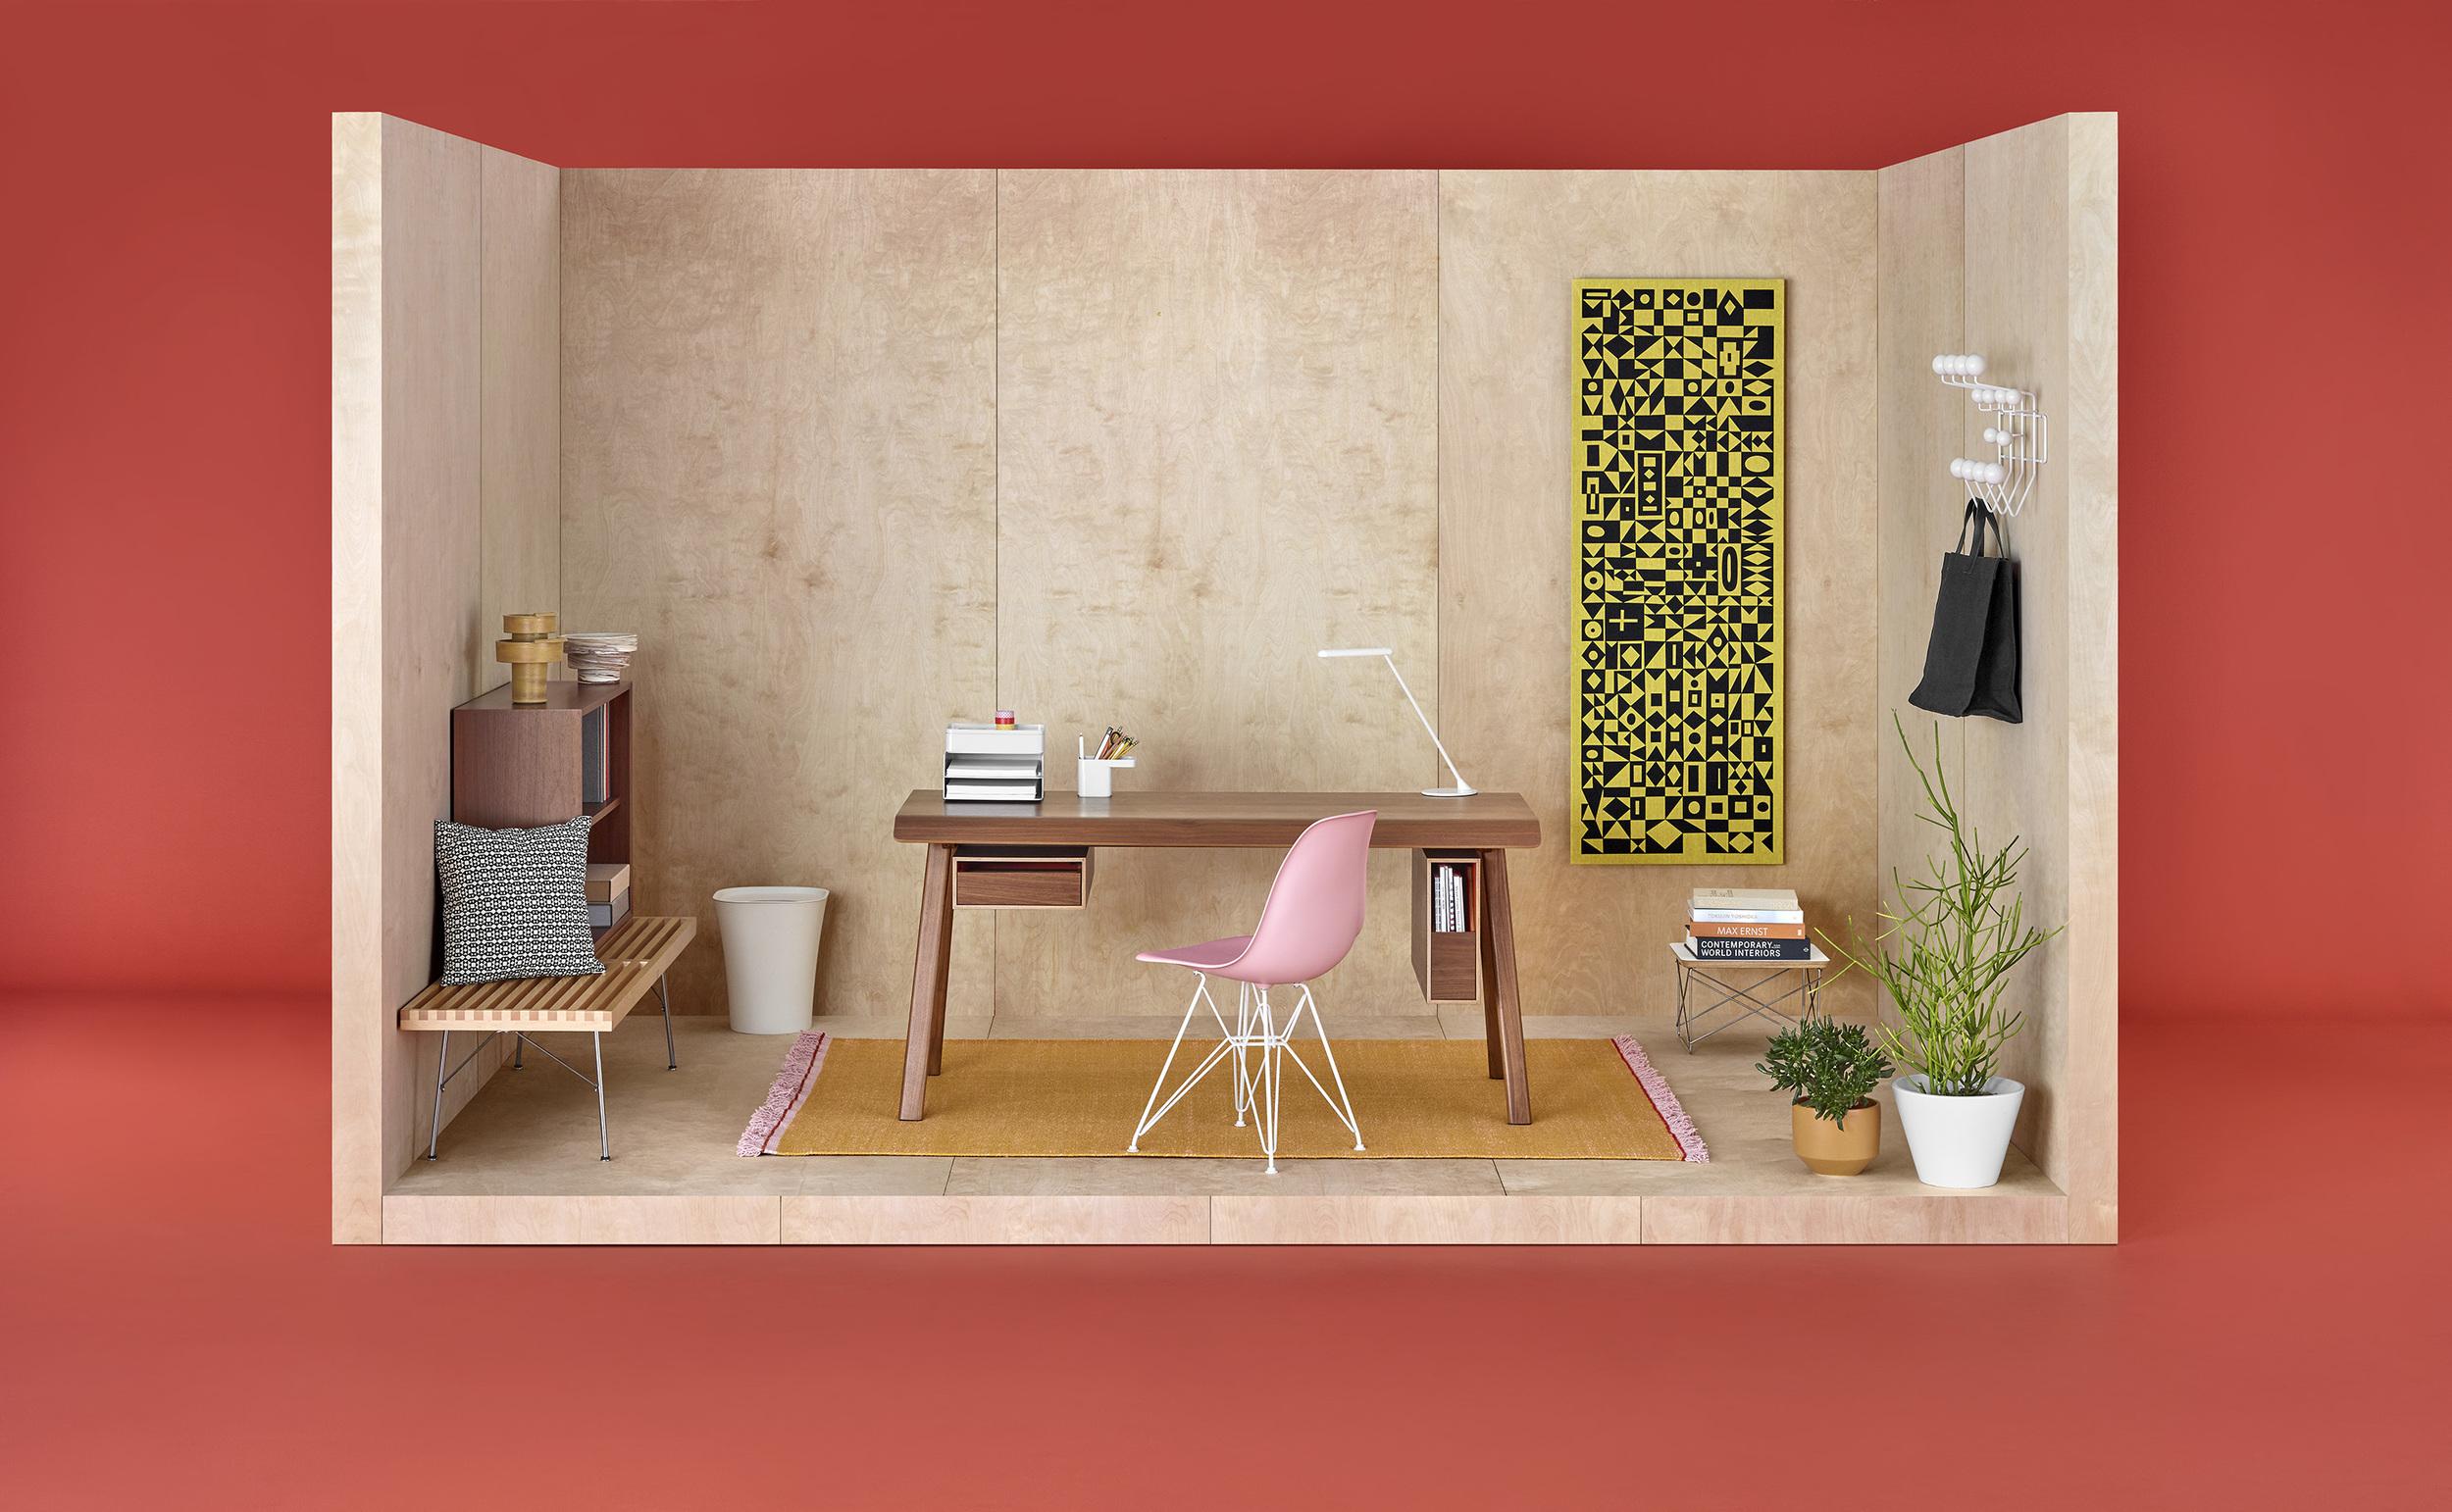 herman miller home office. blueprint for the productive home office campaign herman miller e